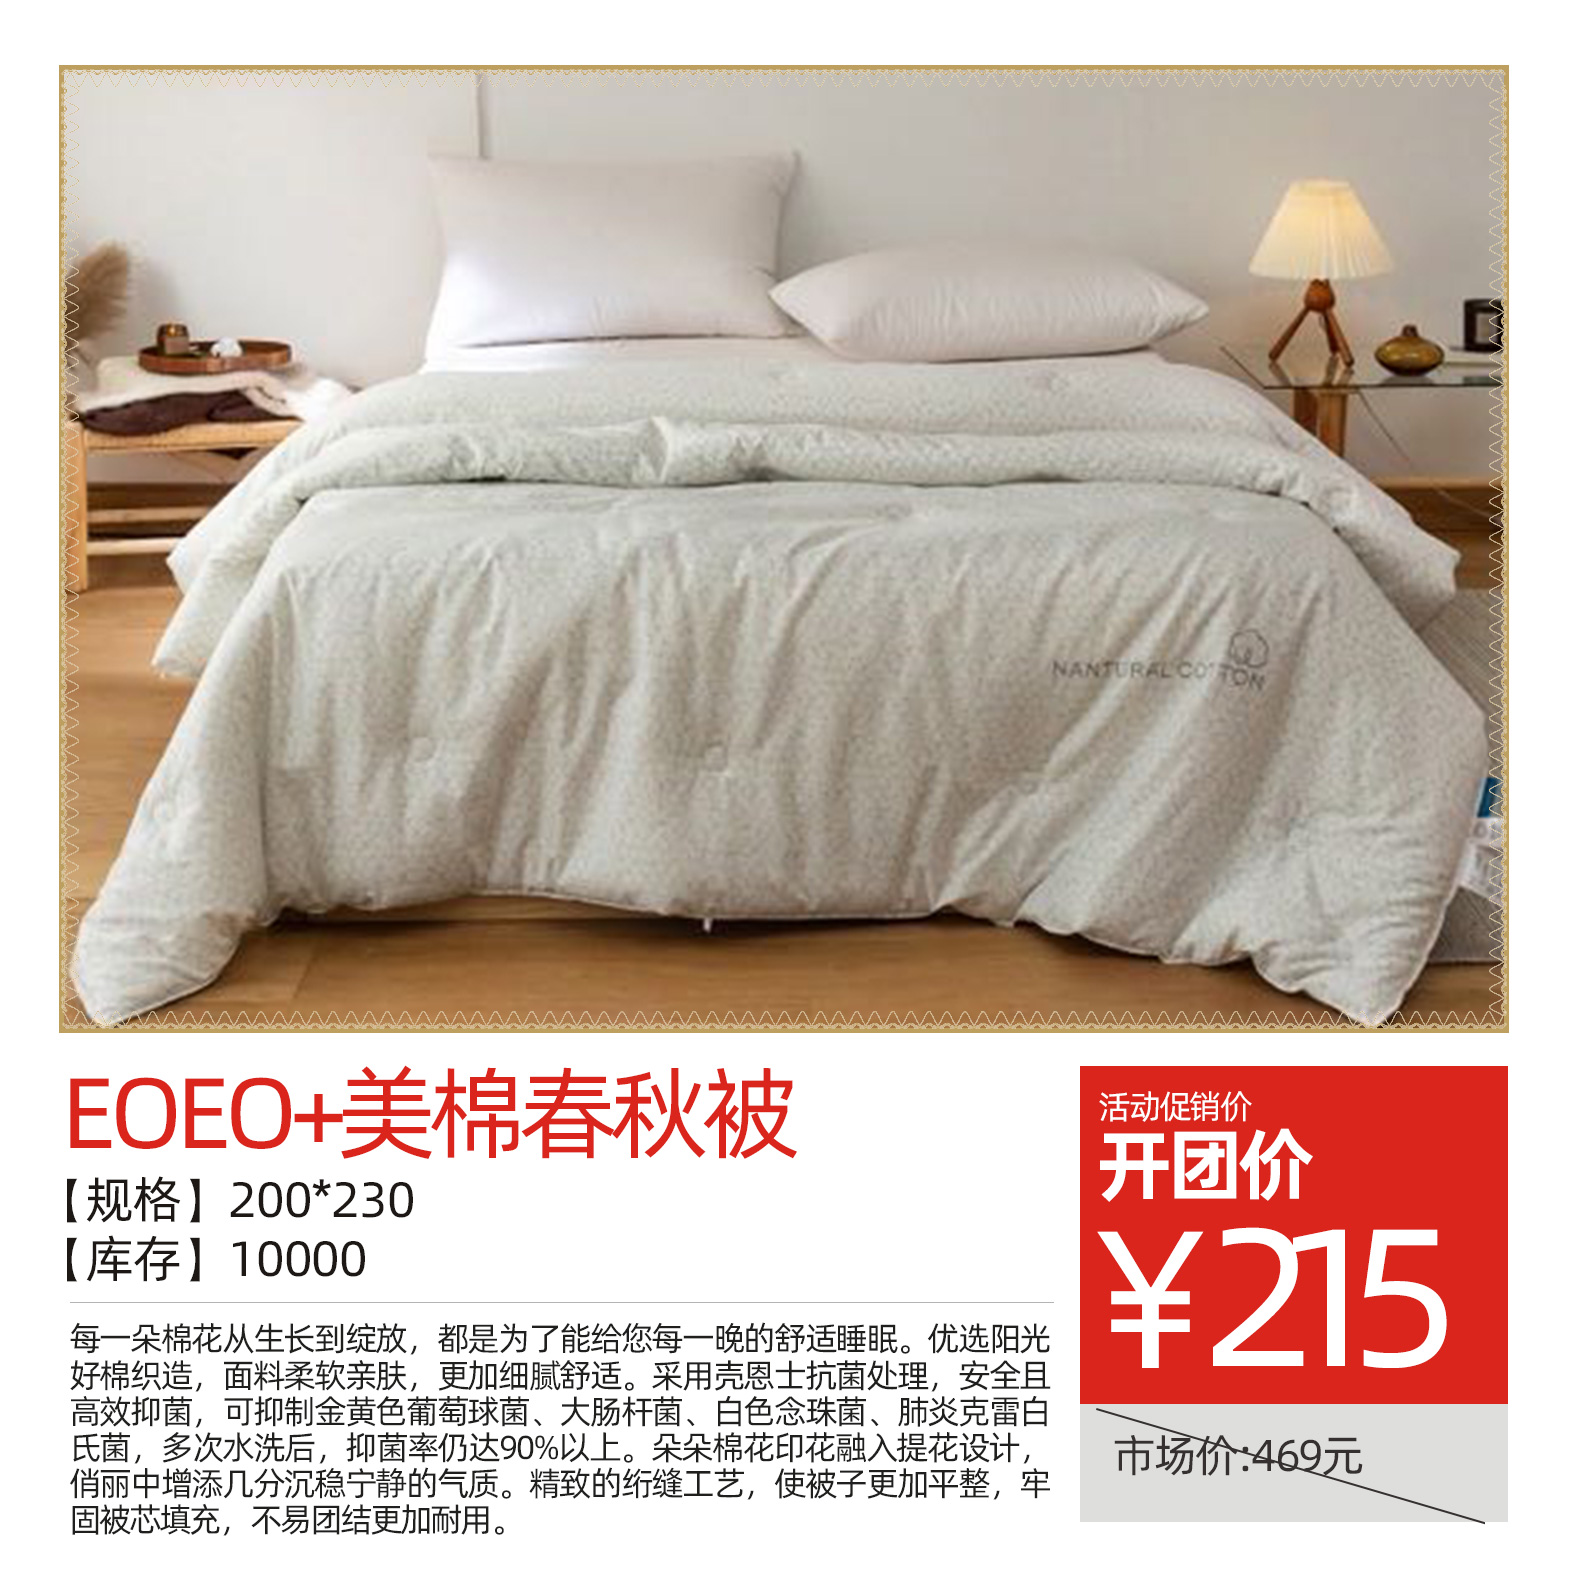 eoeo+有有大豆春秋被200*230